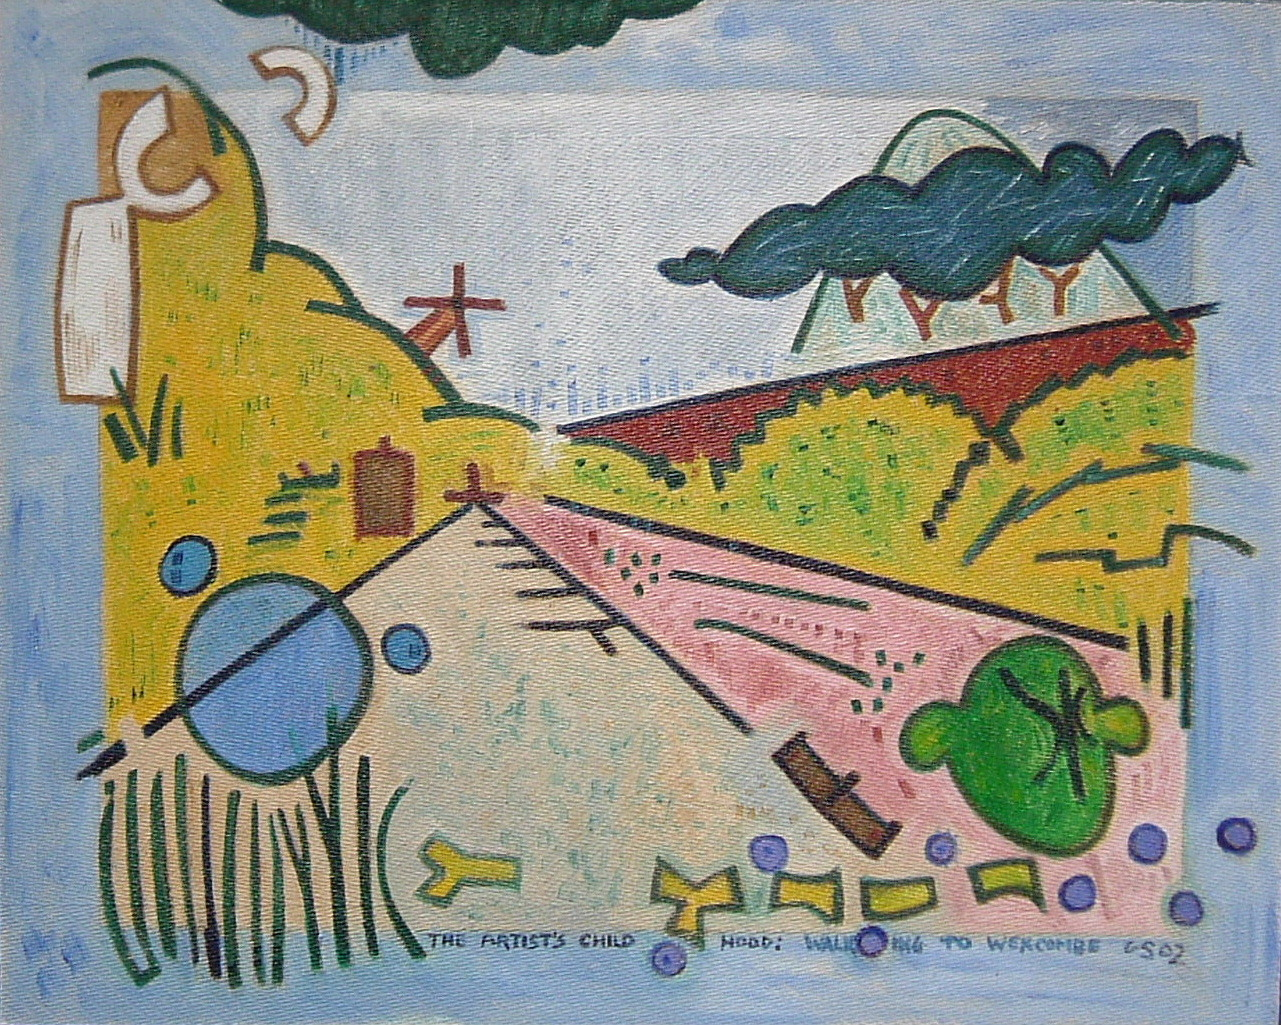 Gerald Shepherd - The Artist's Childhood - Walking To Wexcombe